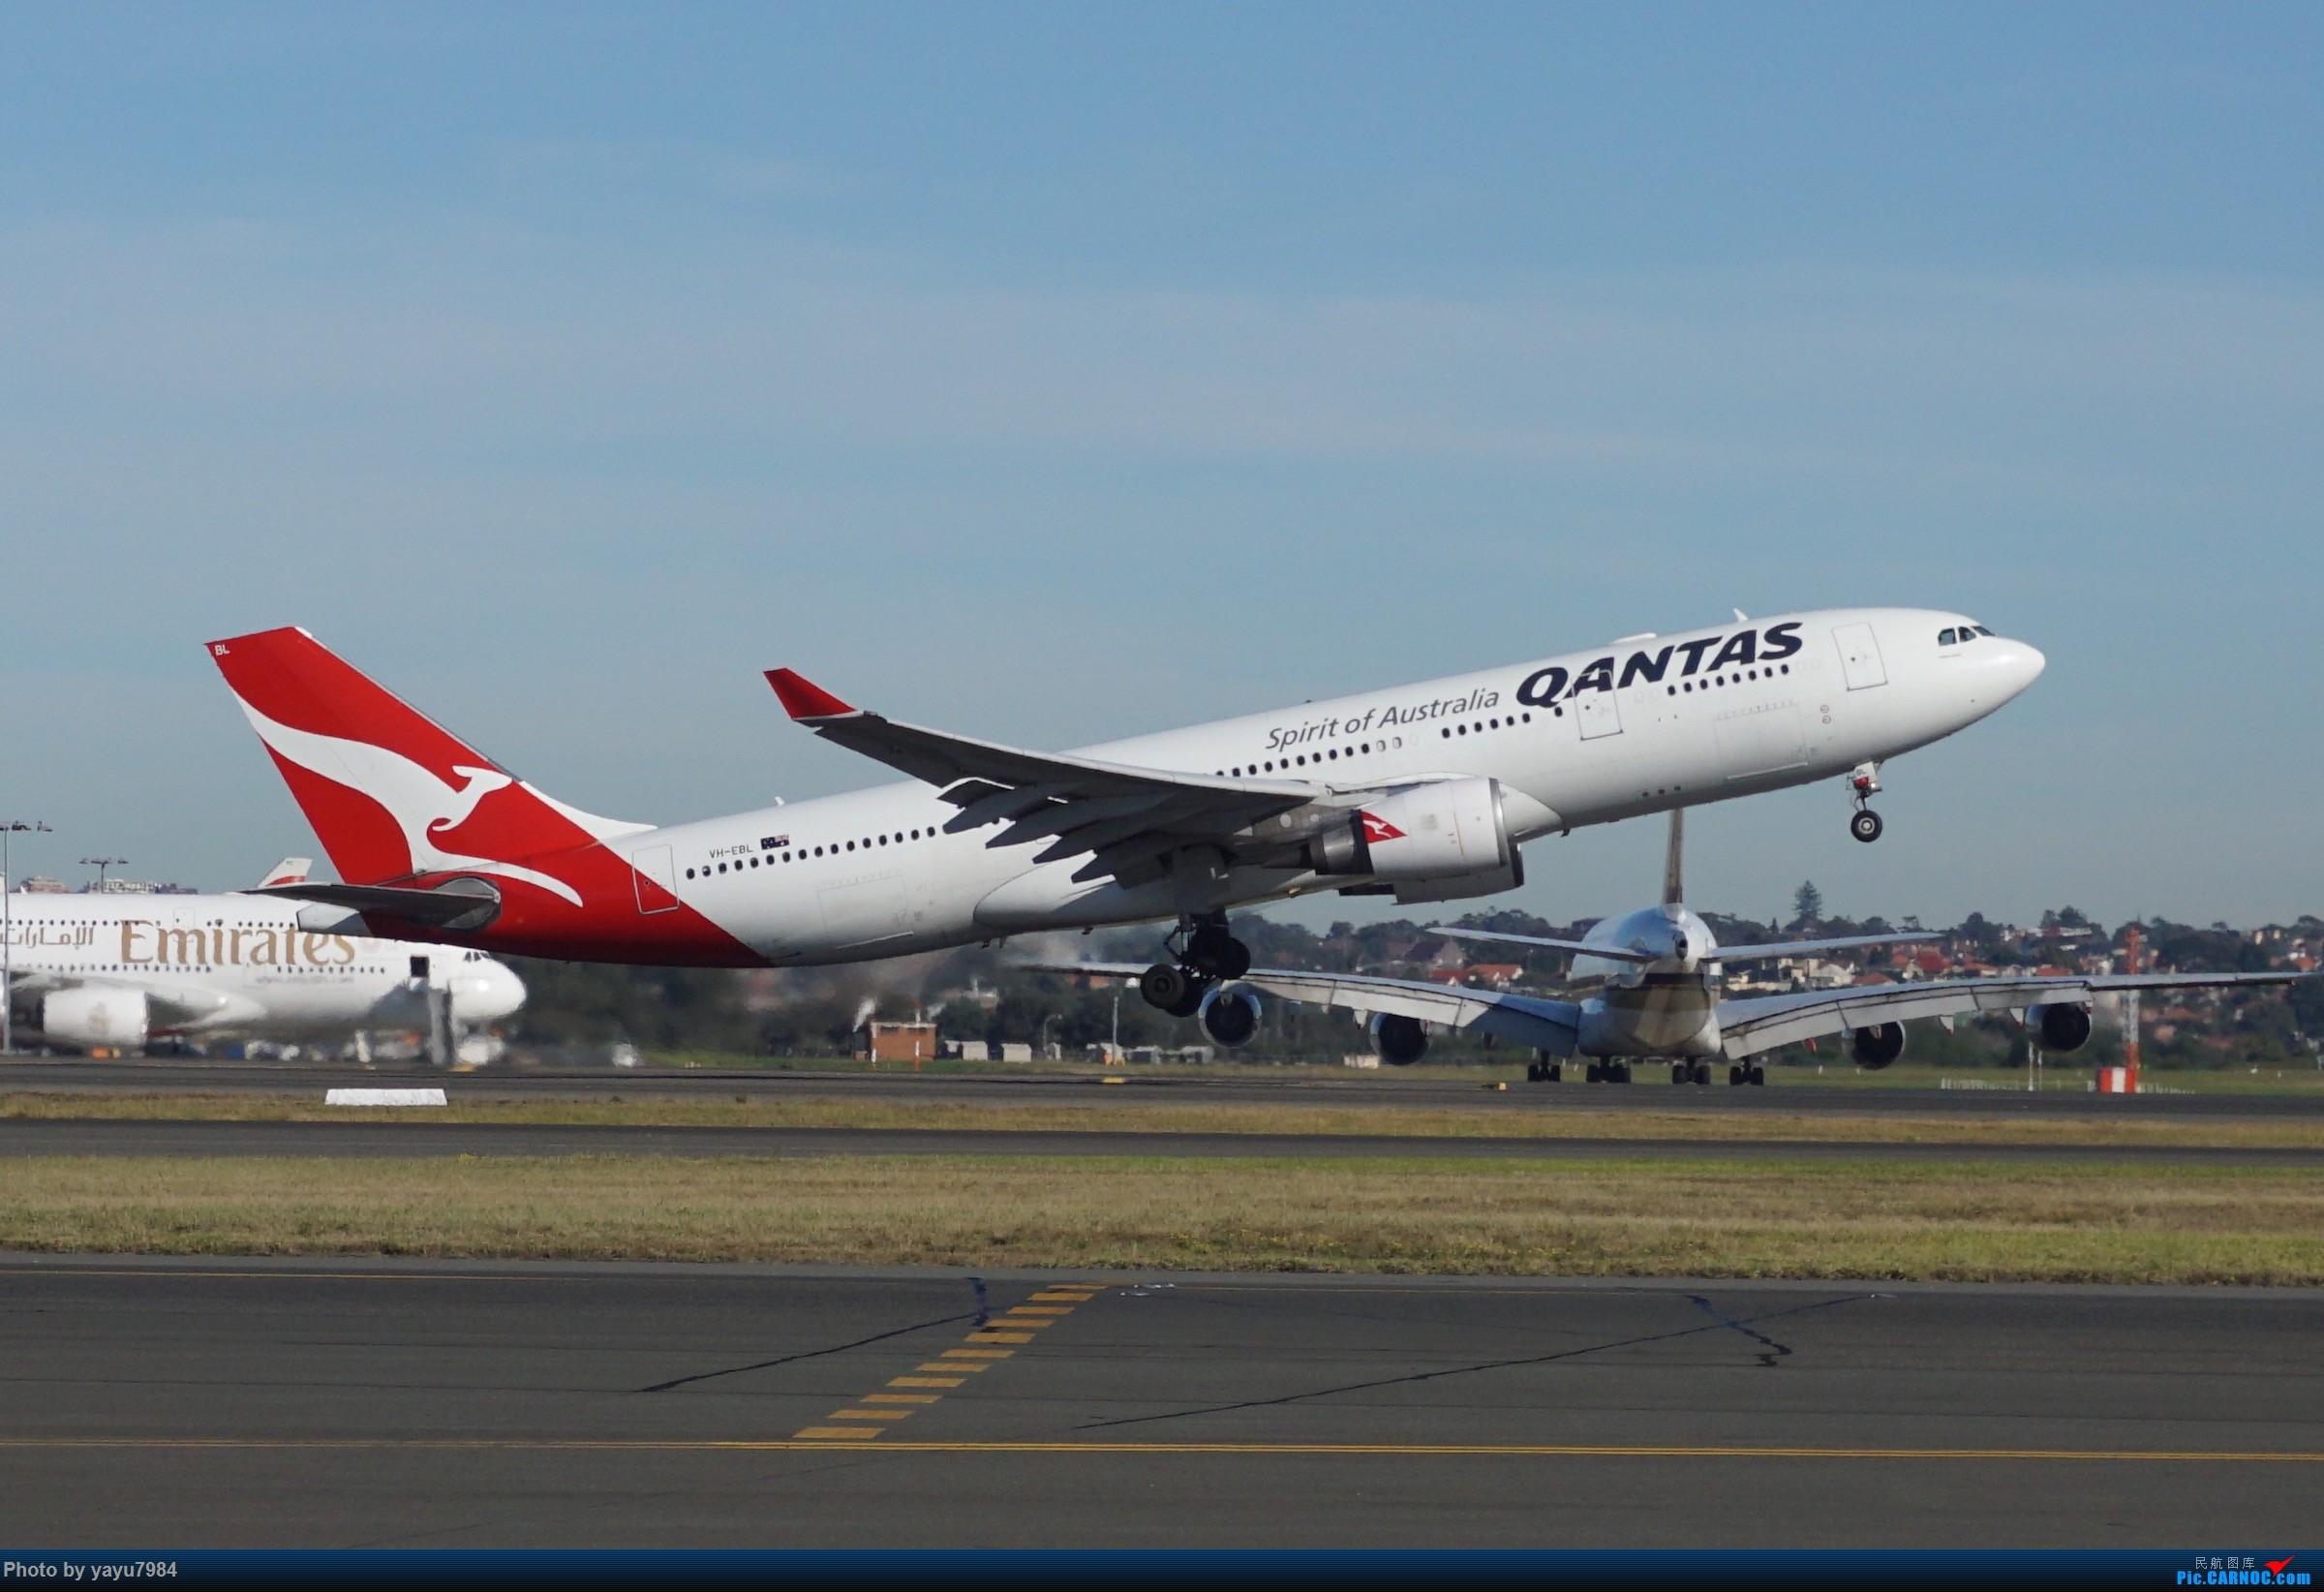 Re:[原创][SYD] 晨悉尼,Blu Emu停车场里拍34L起飞以及滑行 AIRBUS A330-200 VH-EBL 澳大利亚悉尼金斯福德·史密斯机场